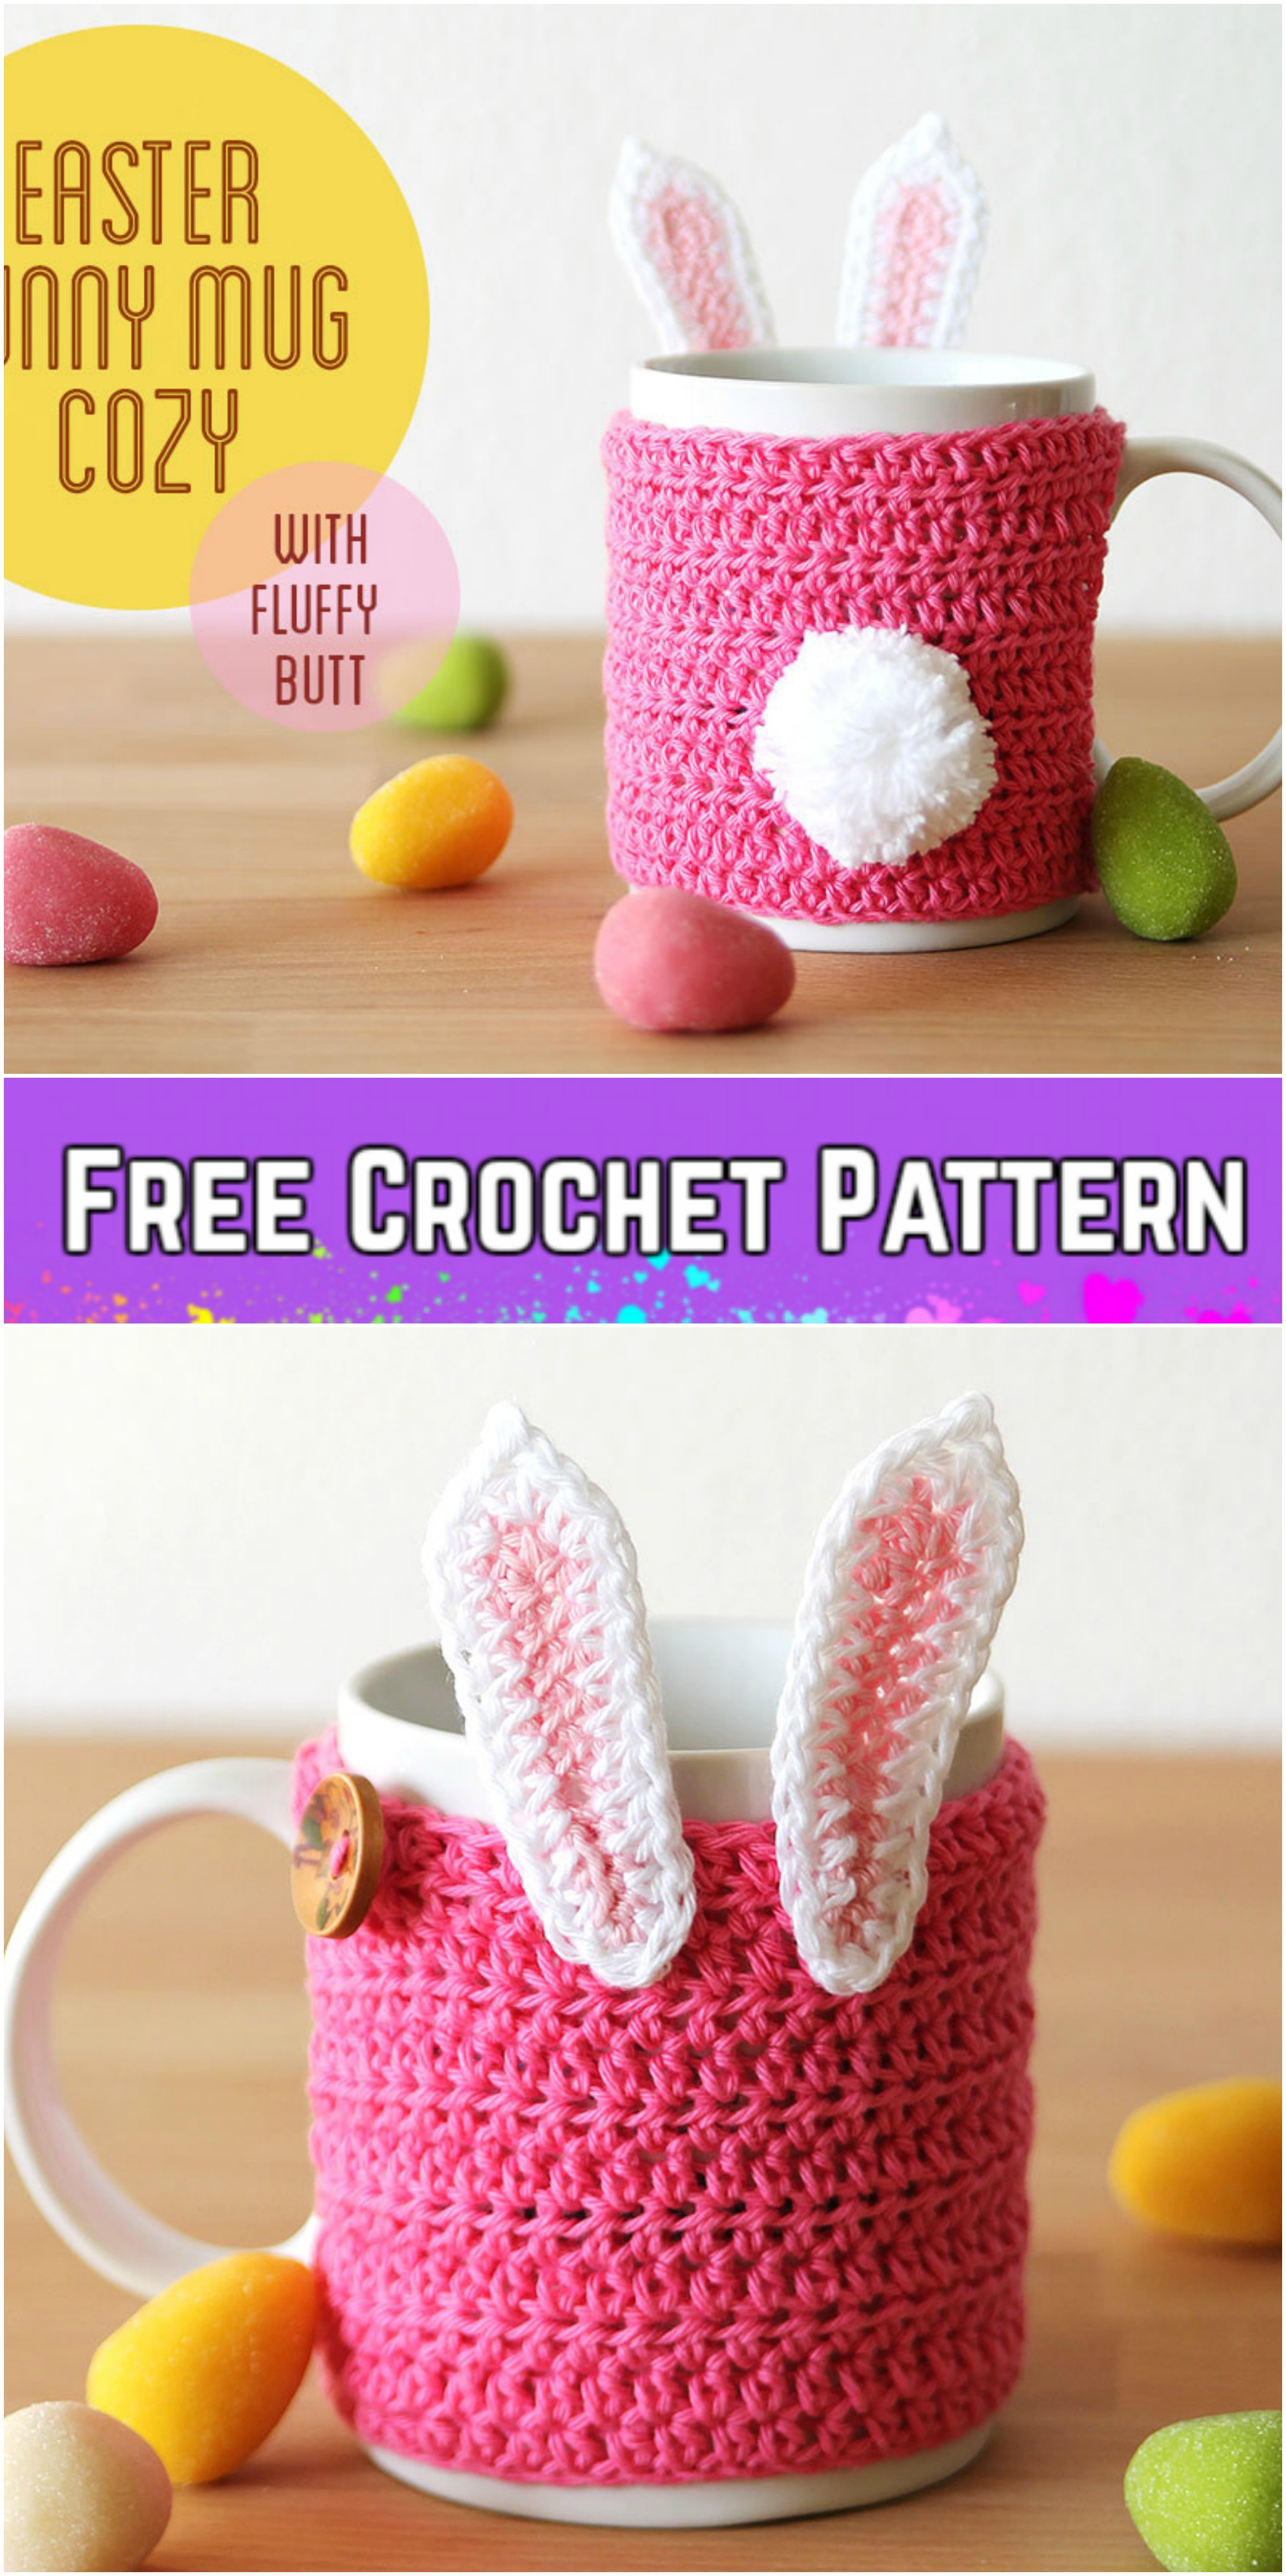 Easter bunny mug cozy free pattern crochet easter bunny mug cozy free pattern dt1010fo